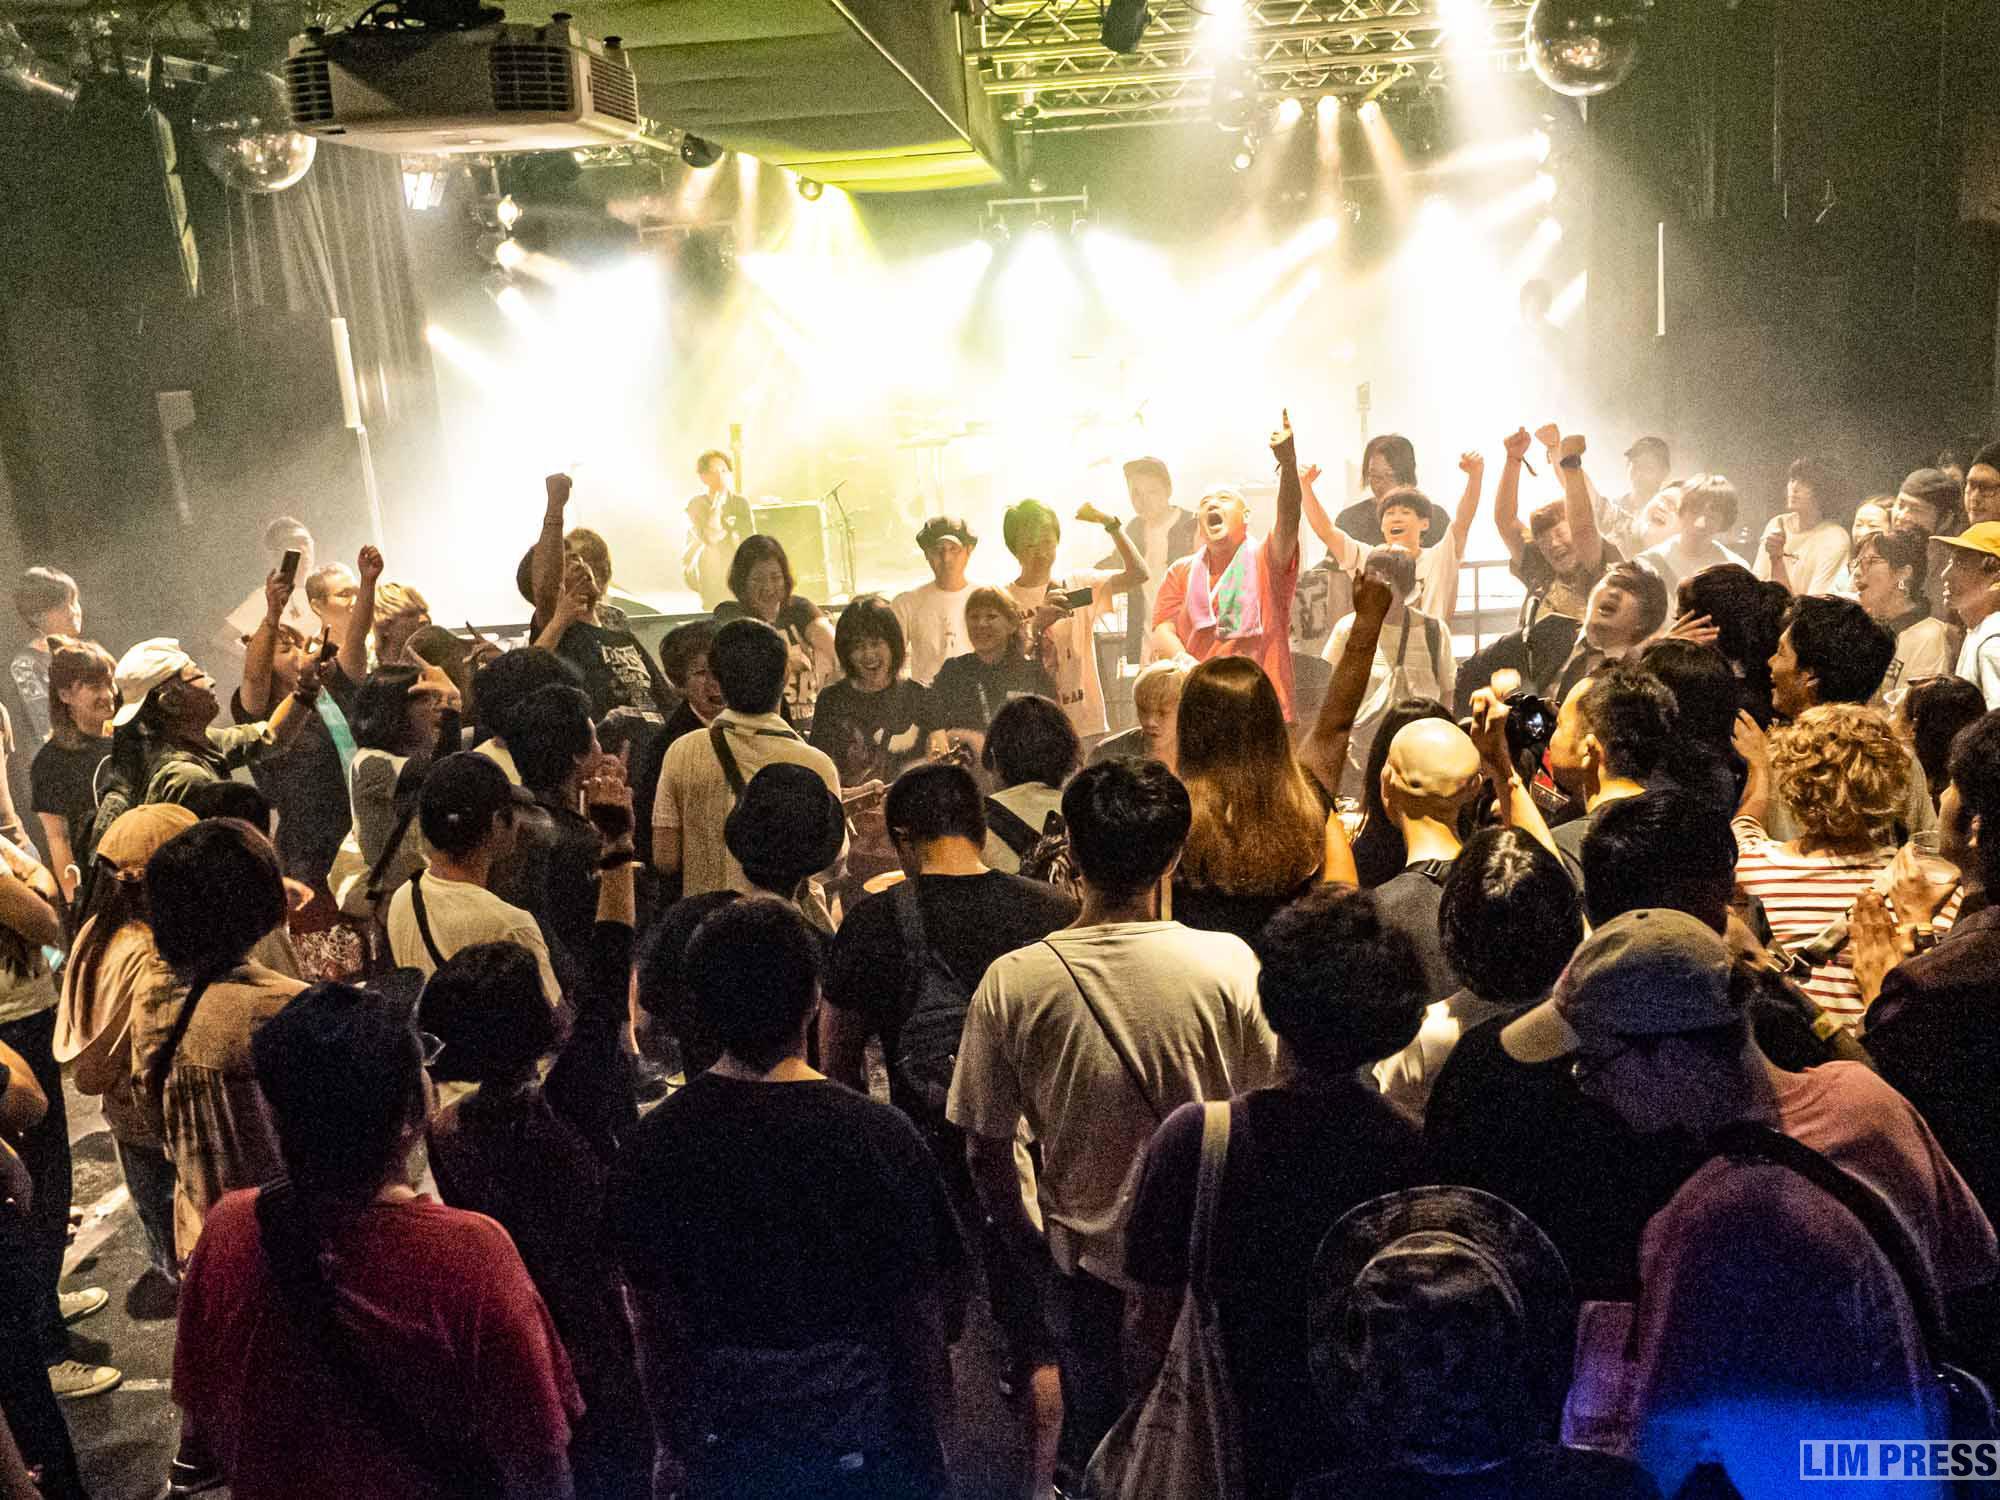 KING BROTHERS | しょんべんフェス in 十三 246GABU | 2019.09.15